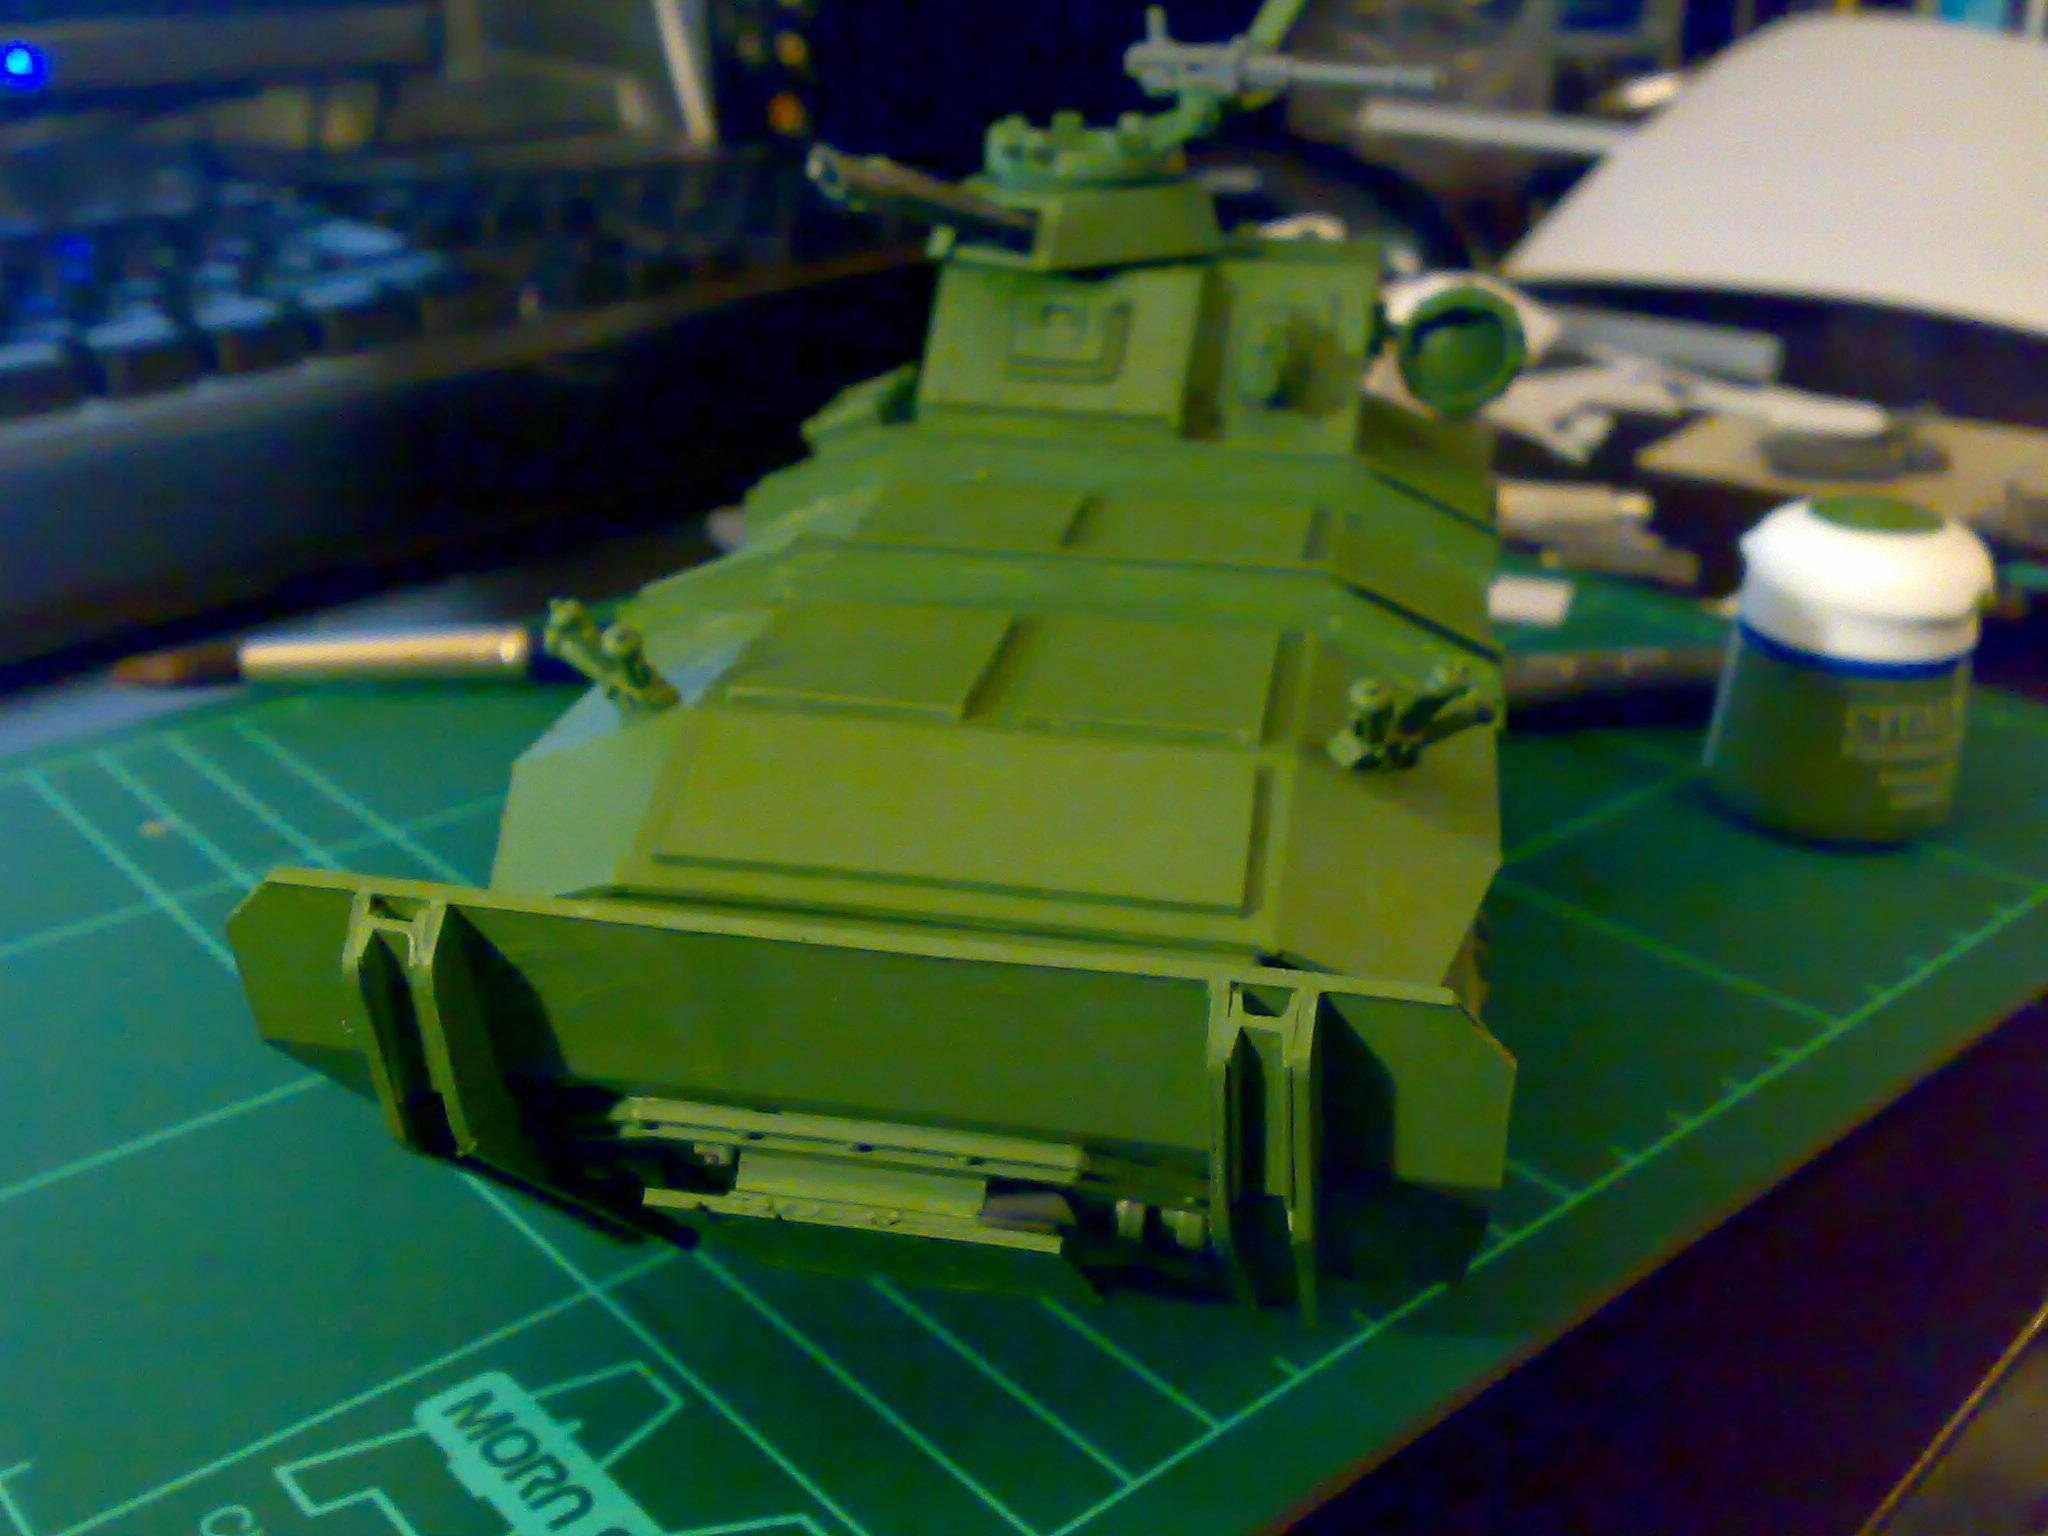 Chimera, Conversion, Gorgon, Imperial Guard, Primered, Tank, Vehicle, Warhammer 40,000